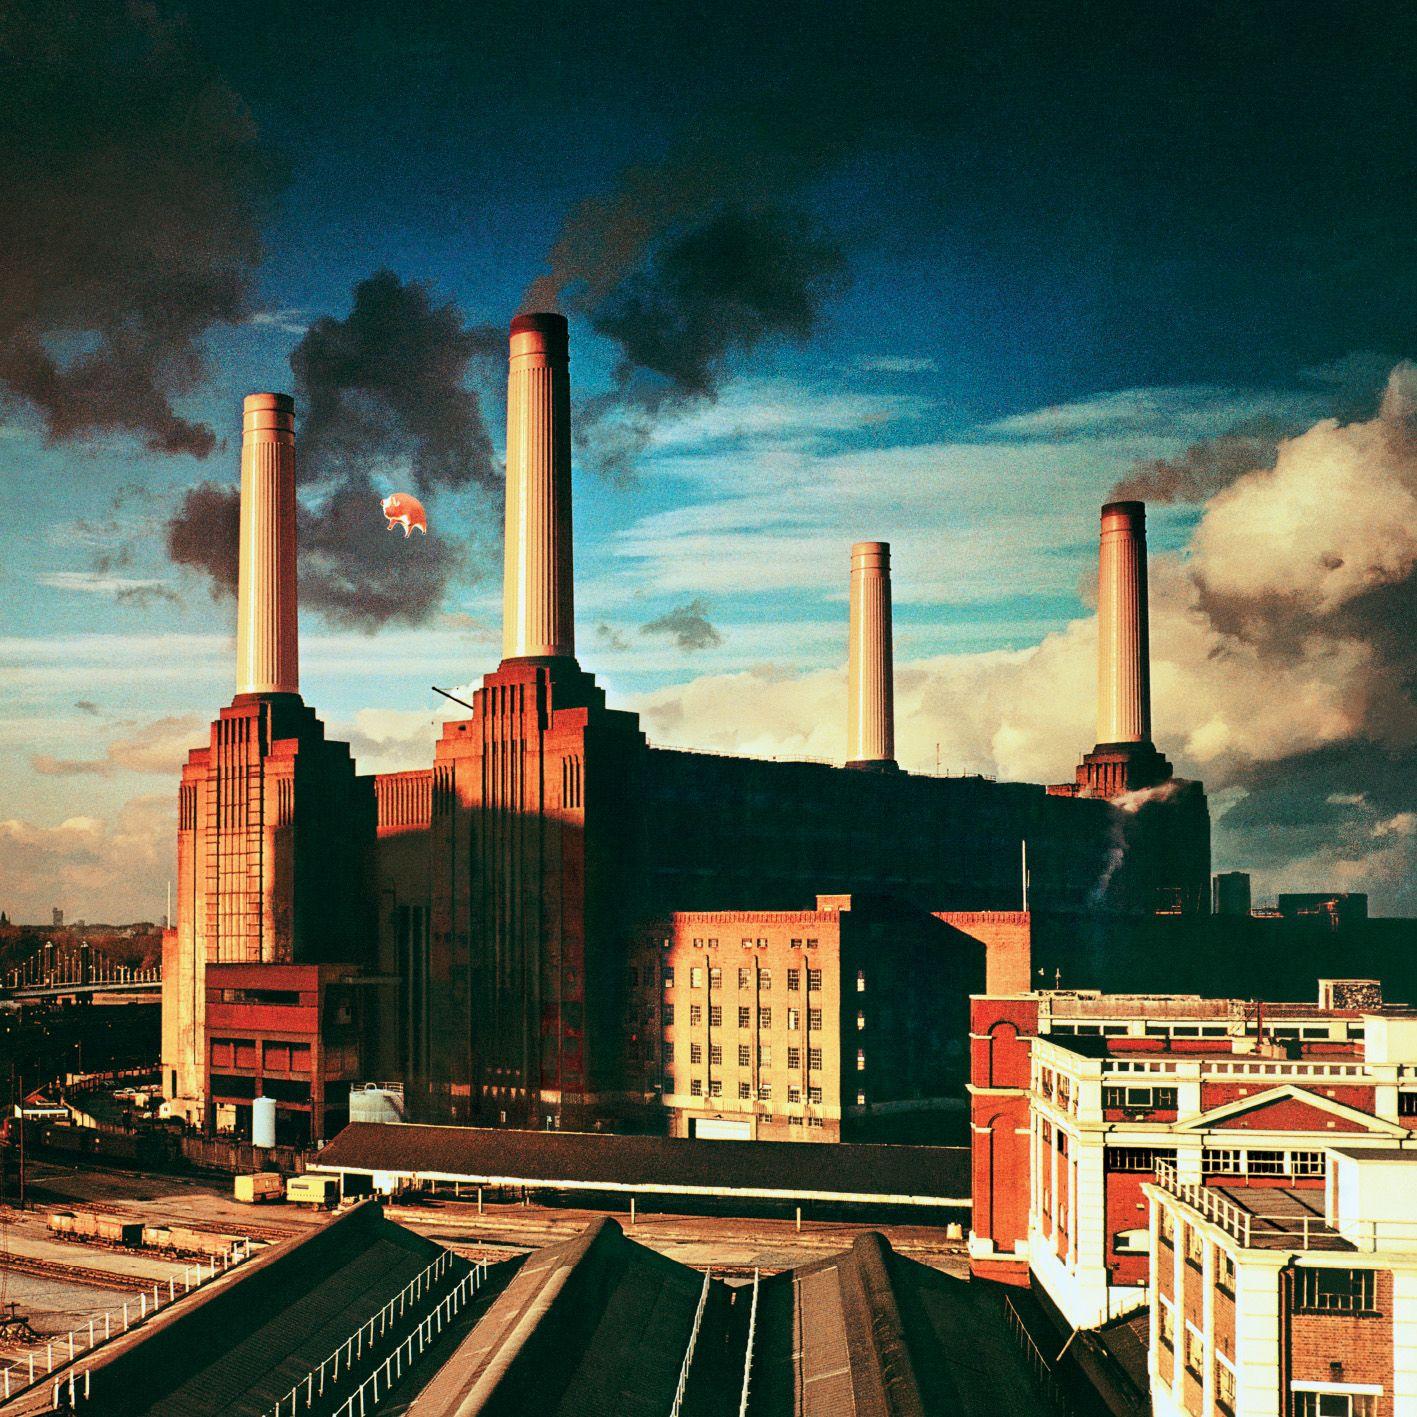 Pink Floyd's Animals album cover